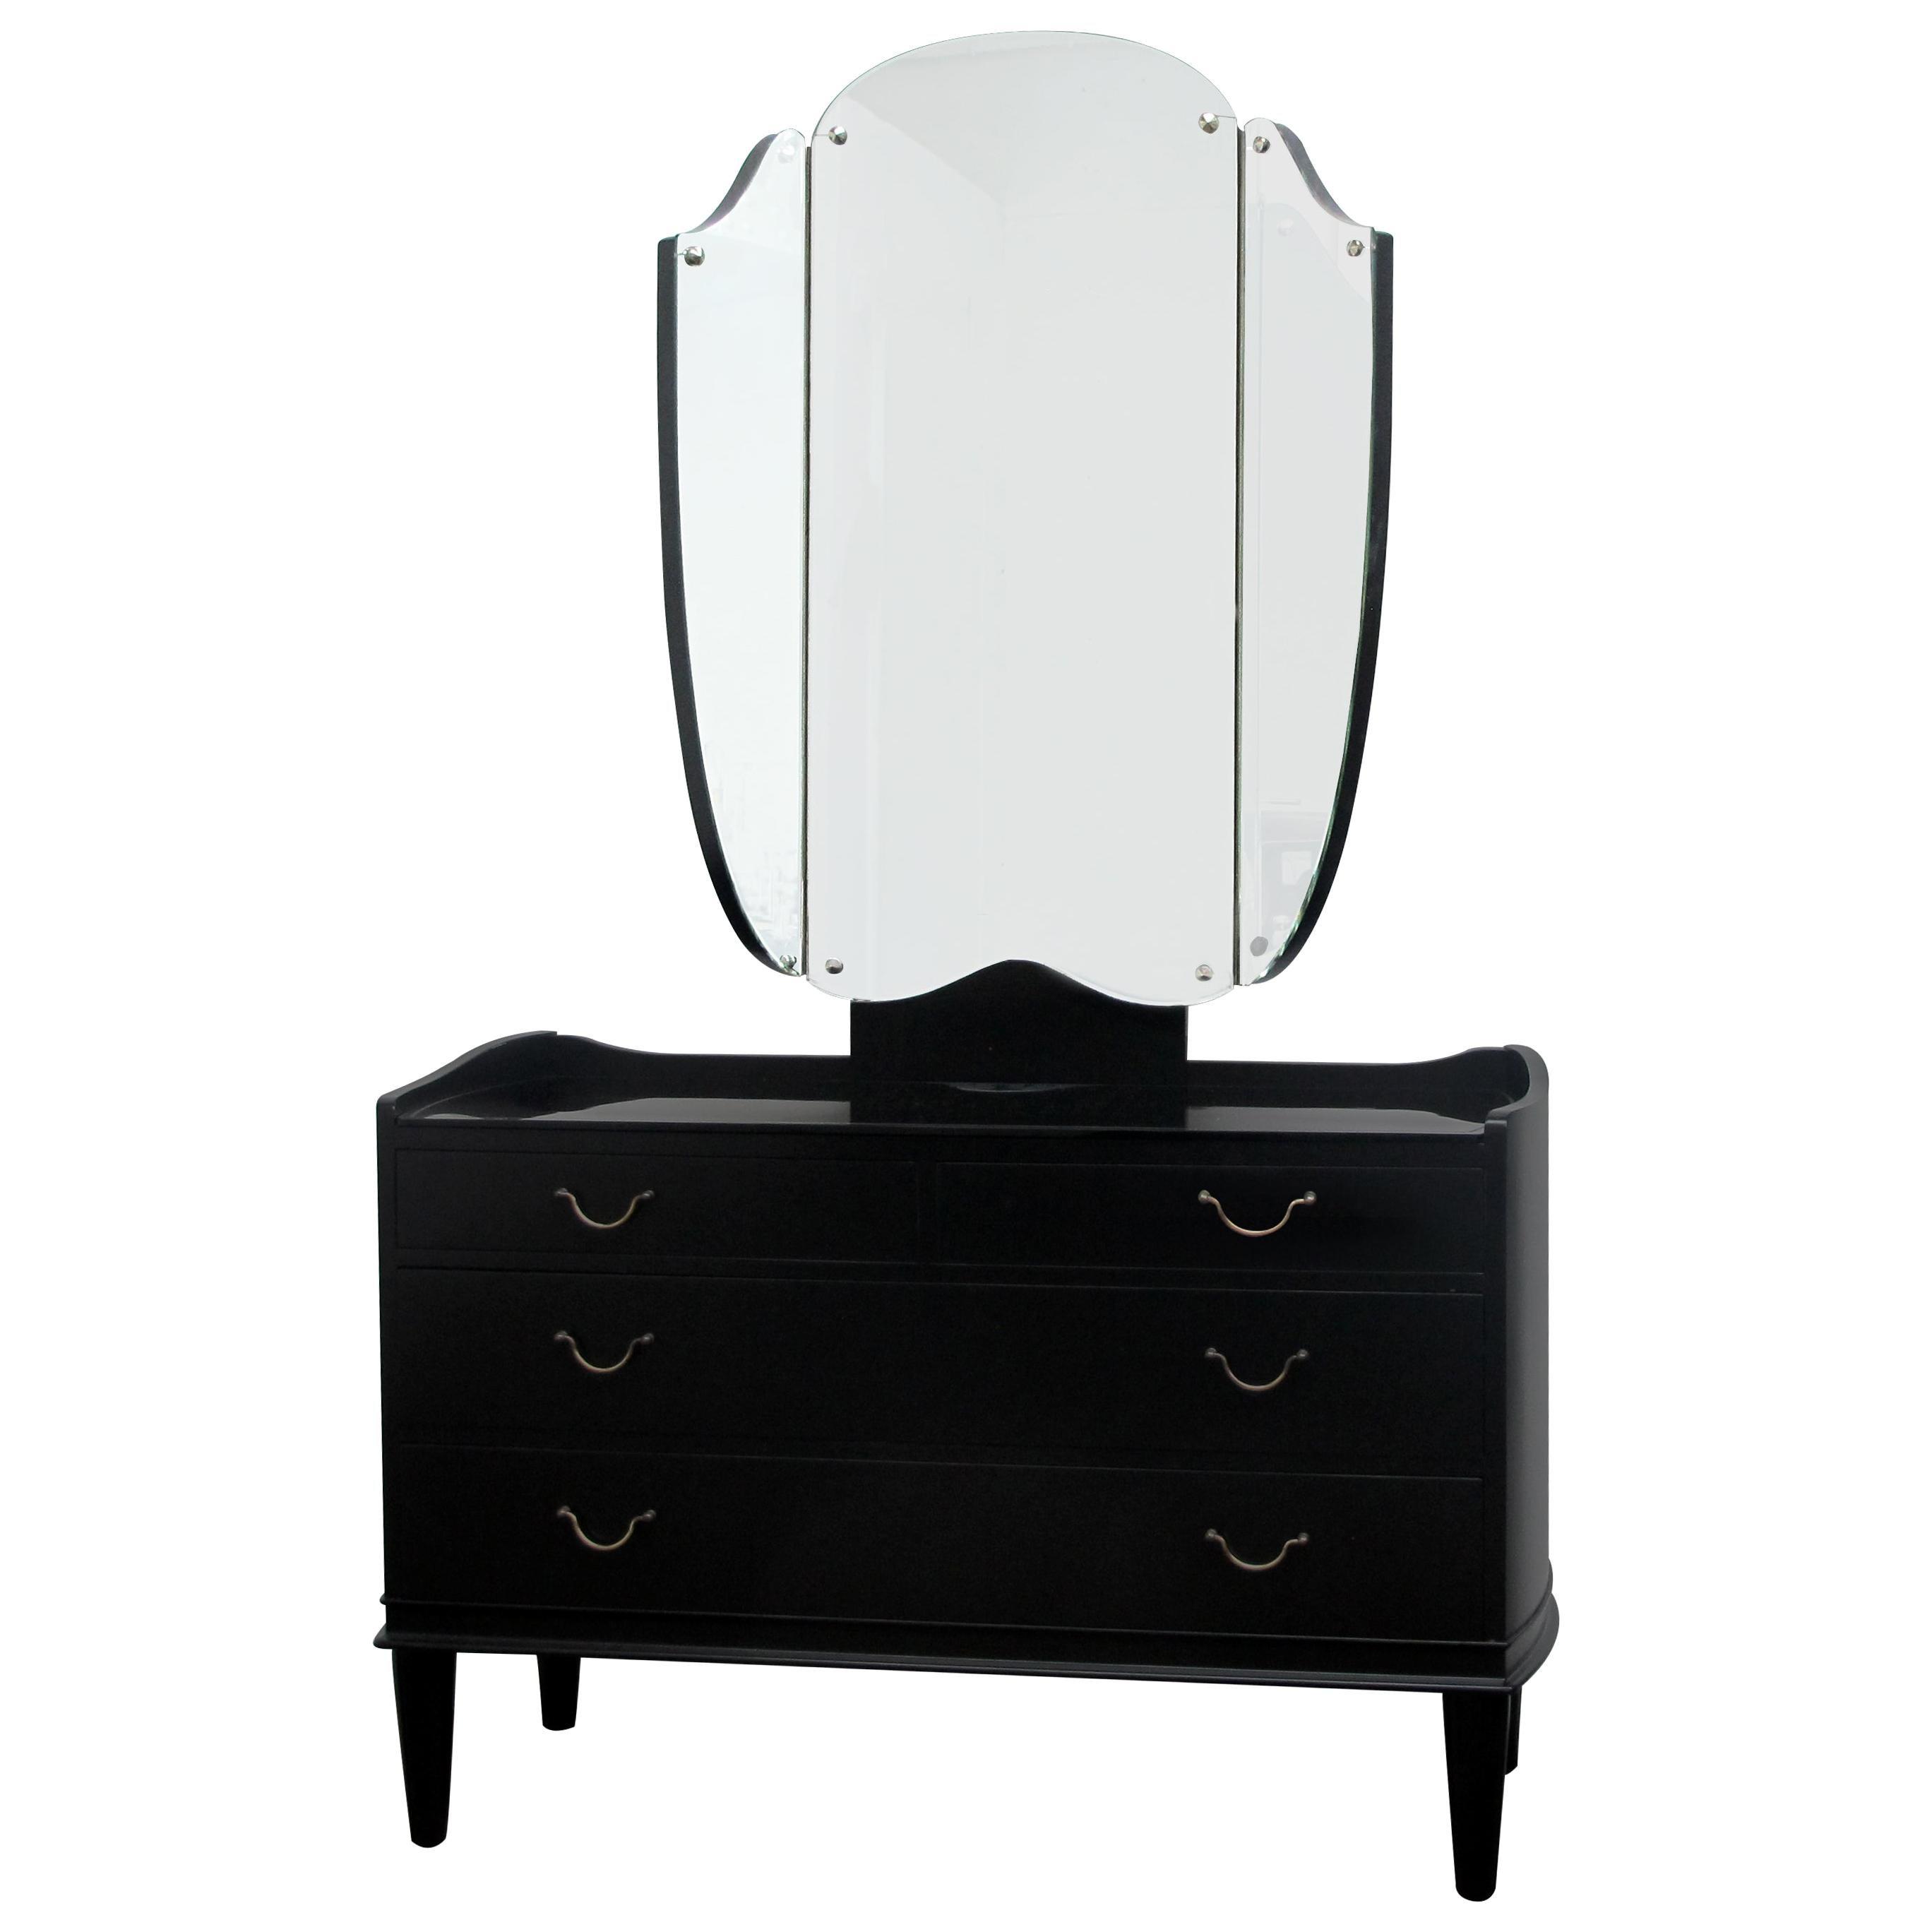 1940s Danish Ebonized Vanity Dressing Table with Triptych Mirror Glass Etch Top